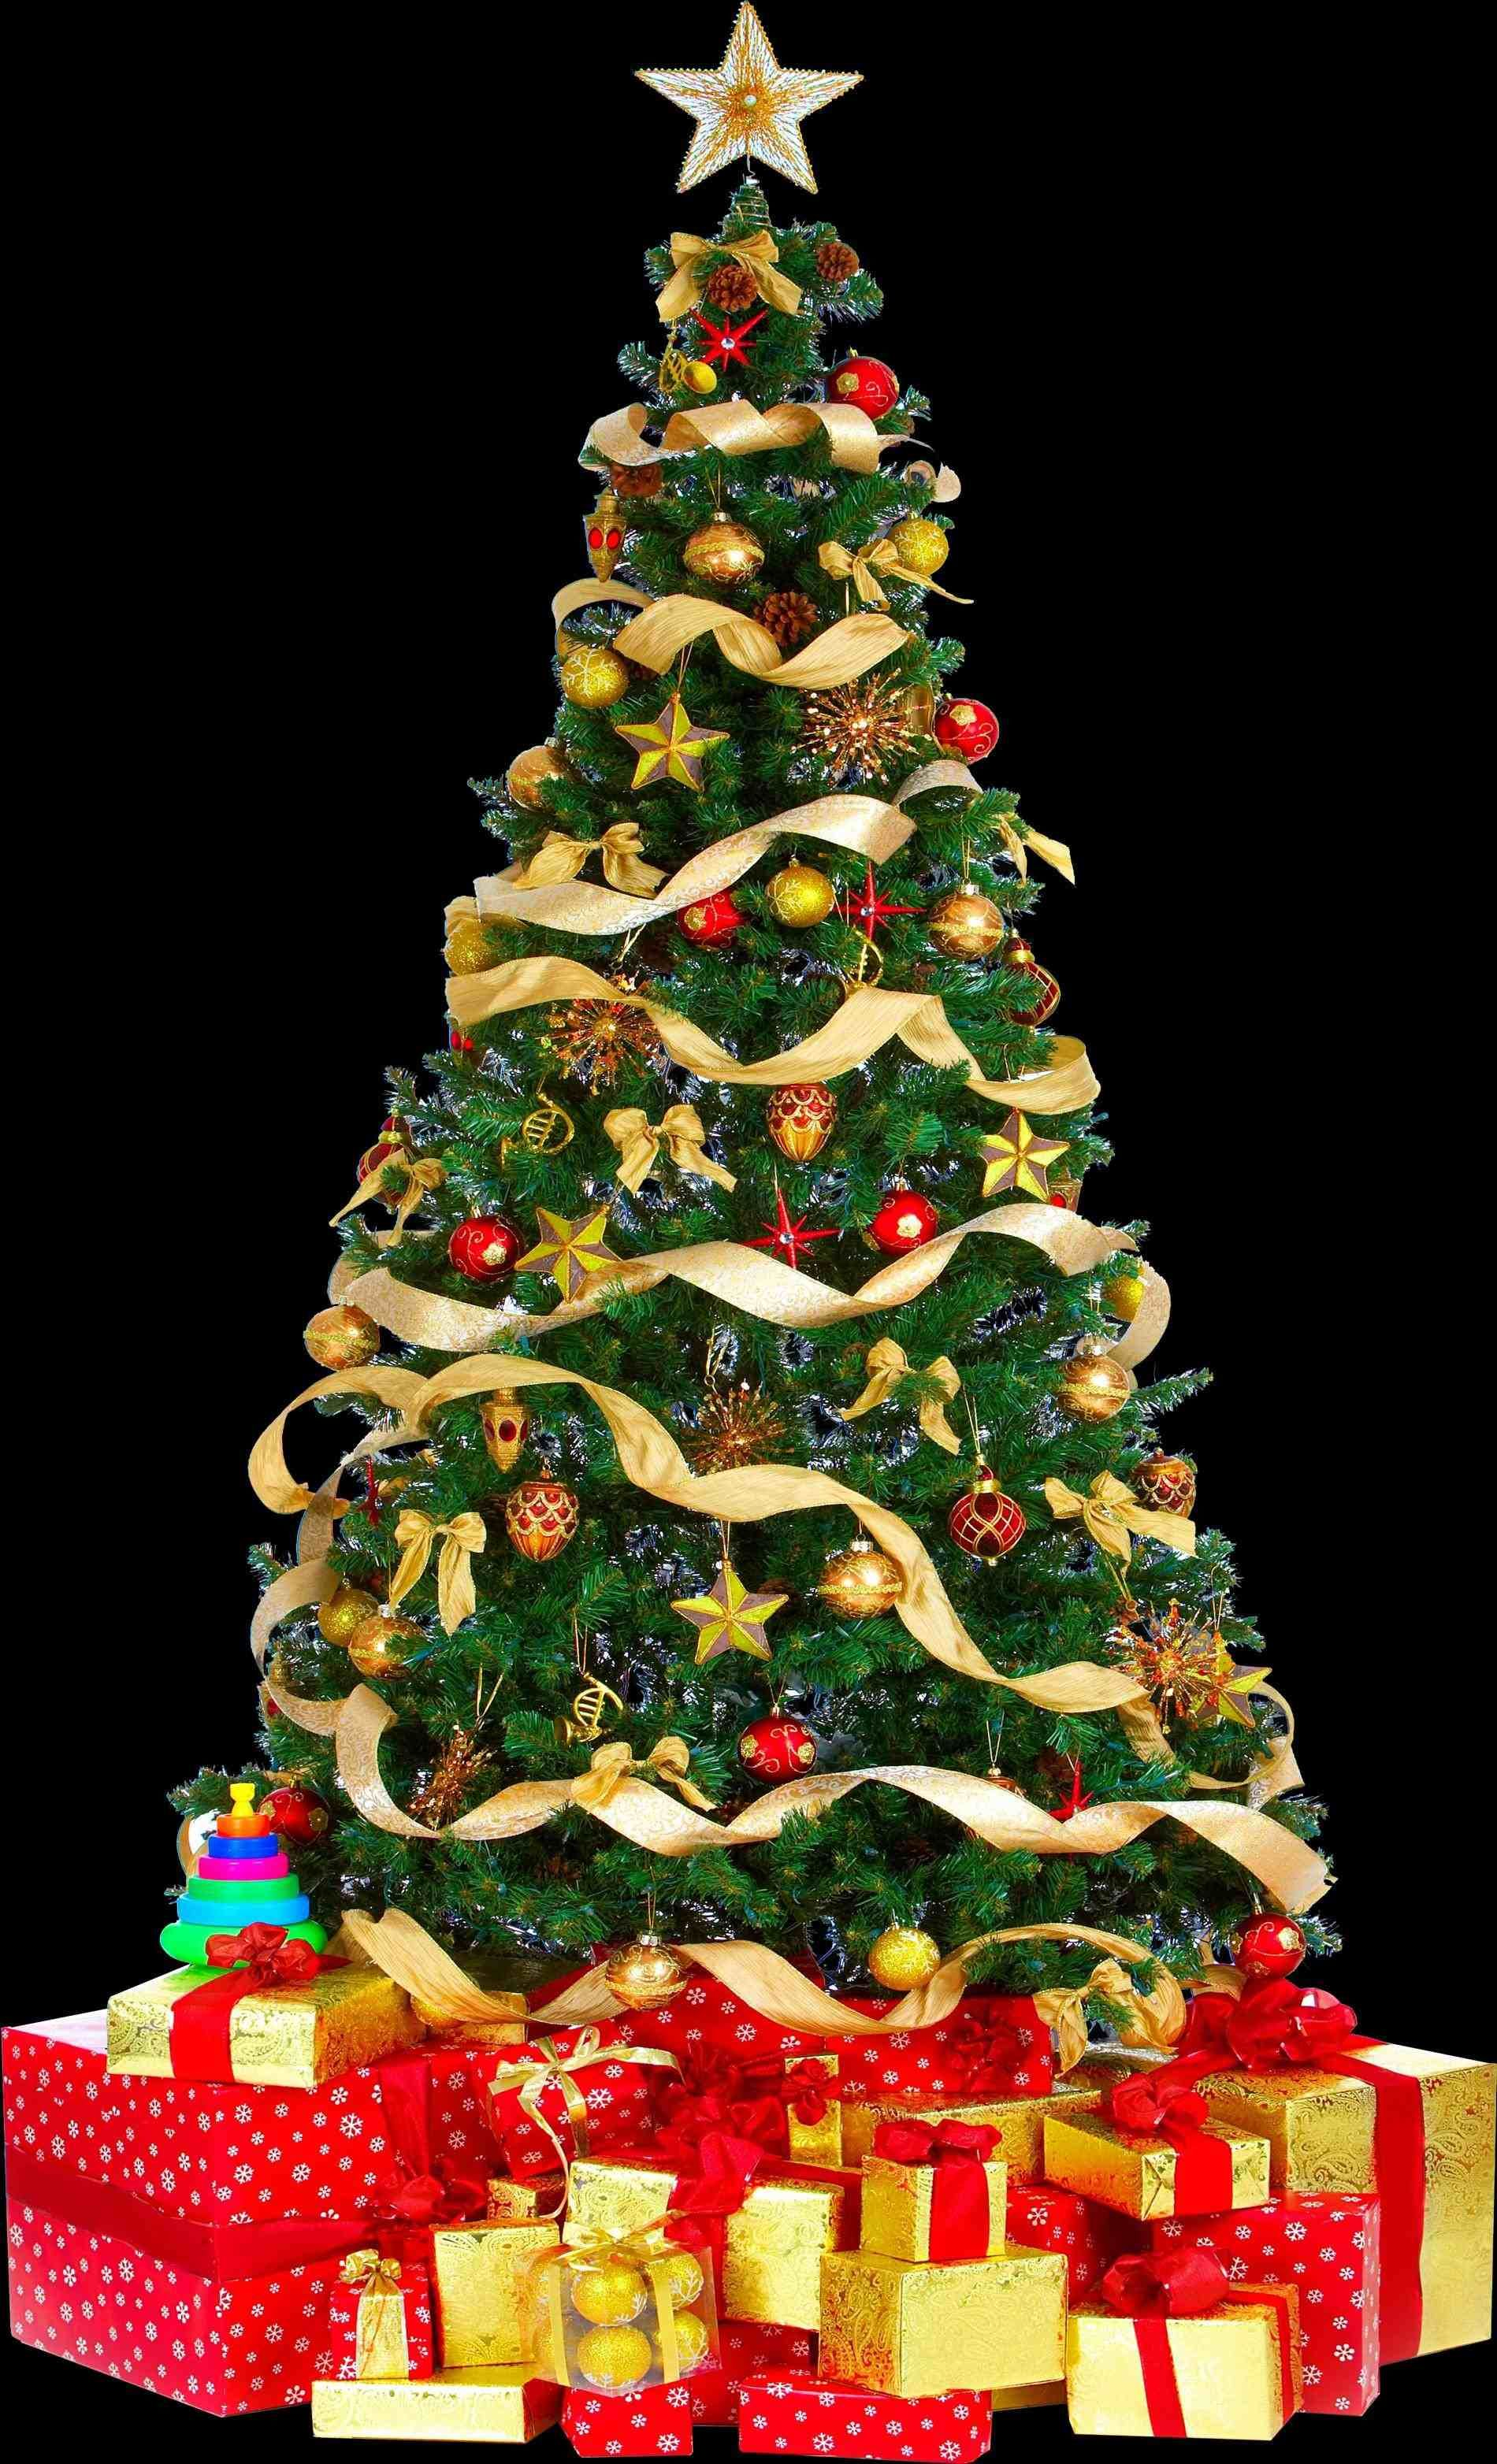 Xmast Site Christmas Tree Green Christmas Tree Christmas Party Invitation Wording